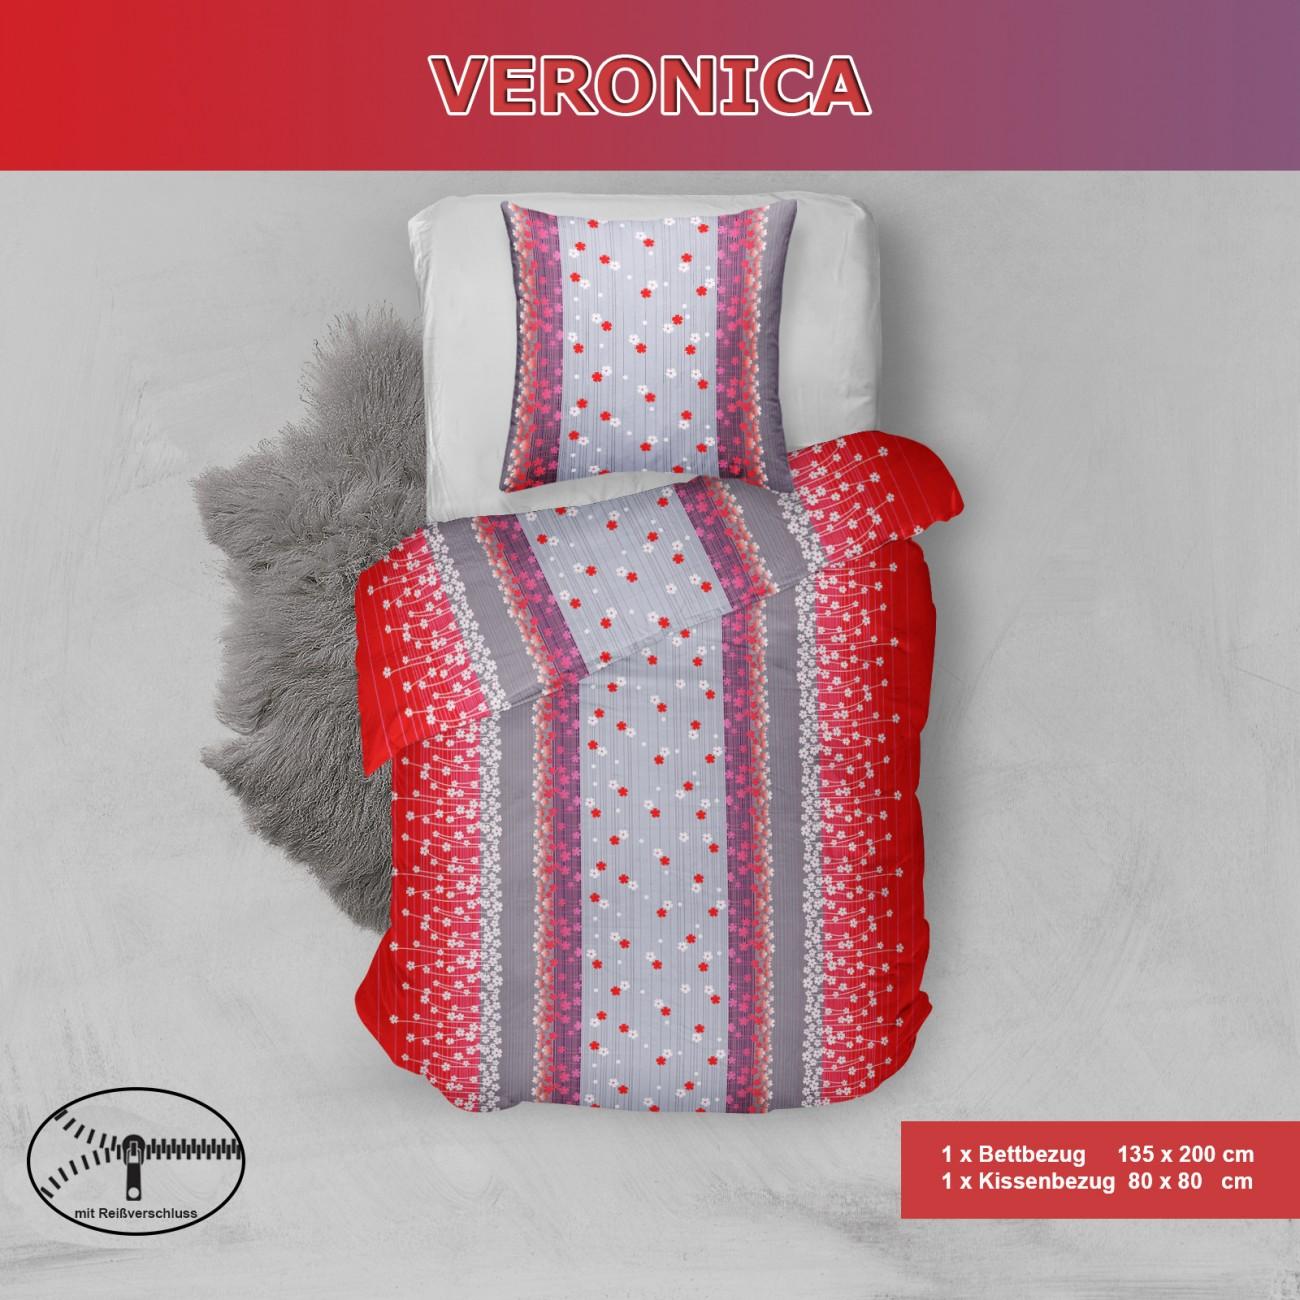 Microfibre Bed Linen Set 135 x 200 cm 100 Polyester 2 or